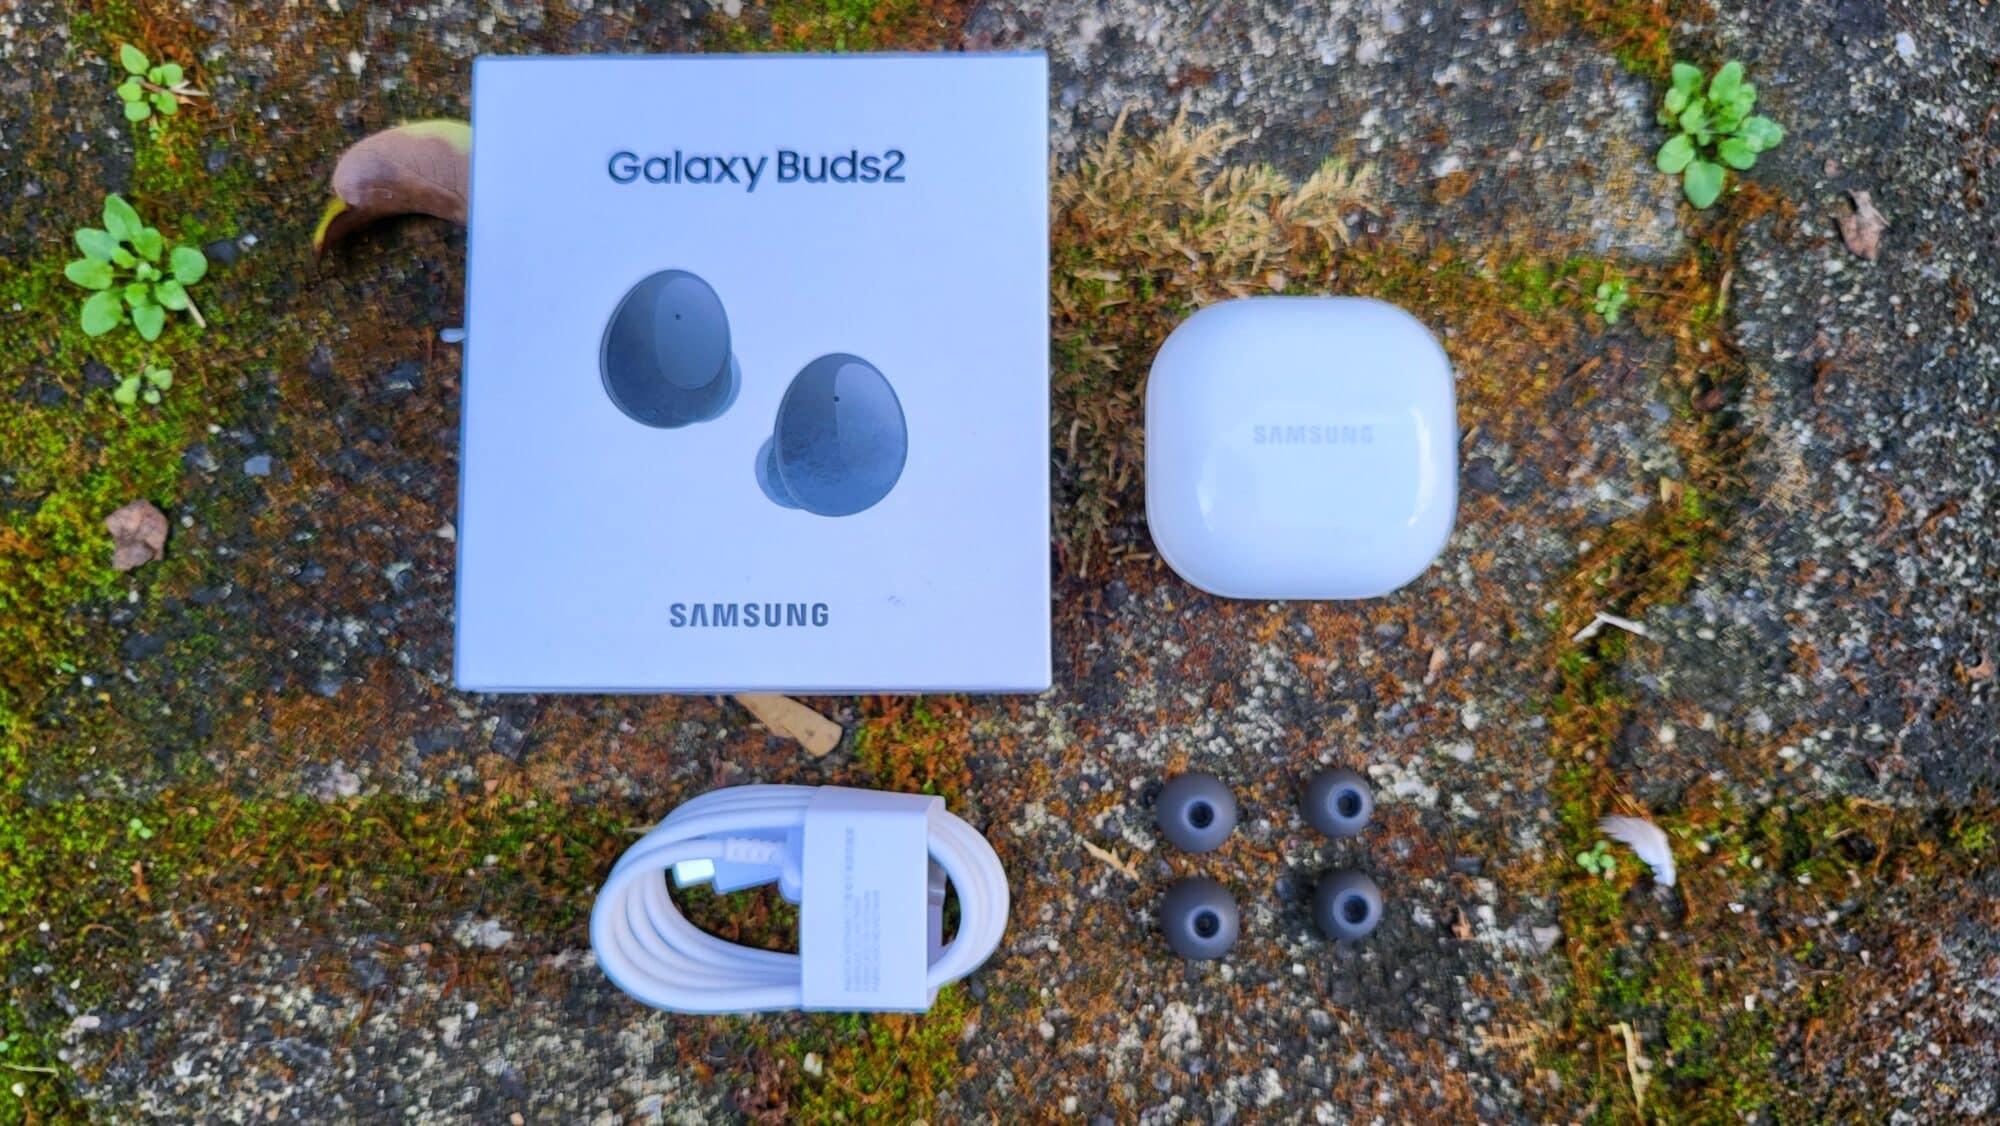 Galaxy Buds 2 - packaging